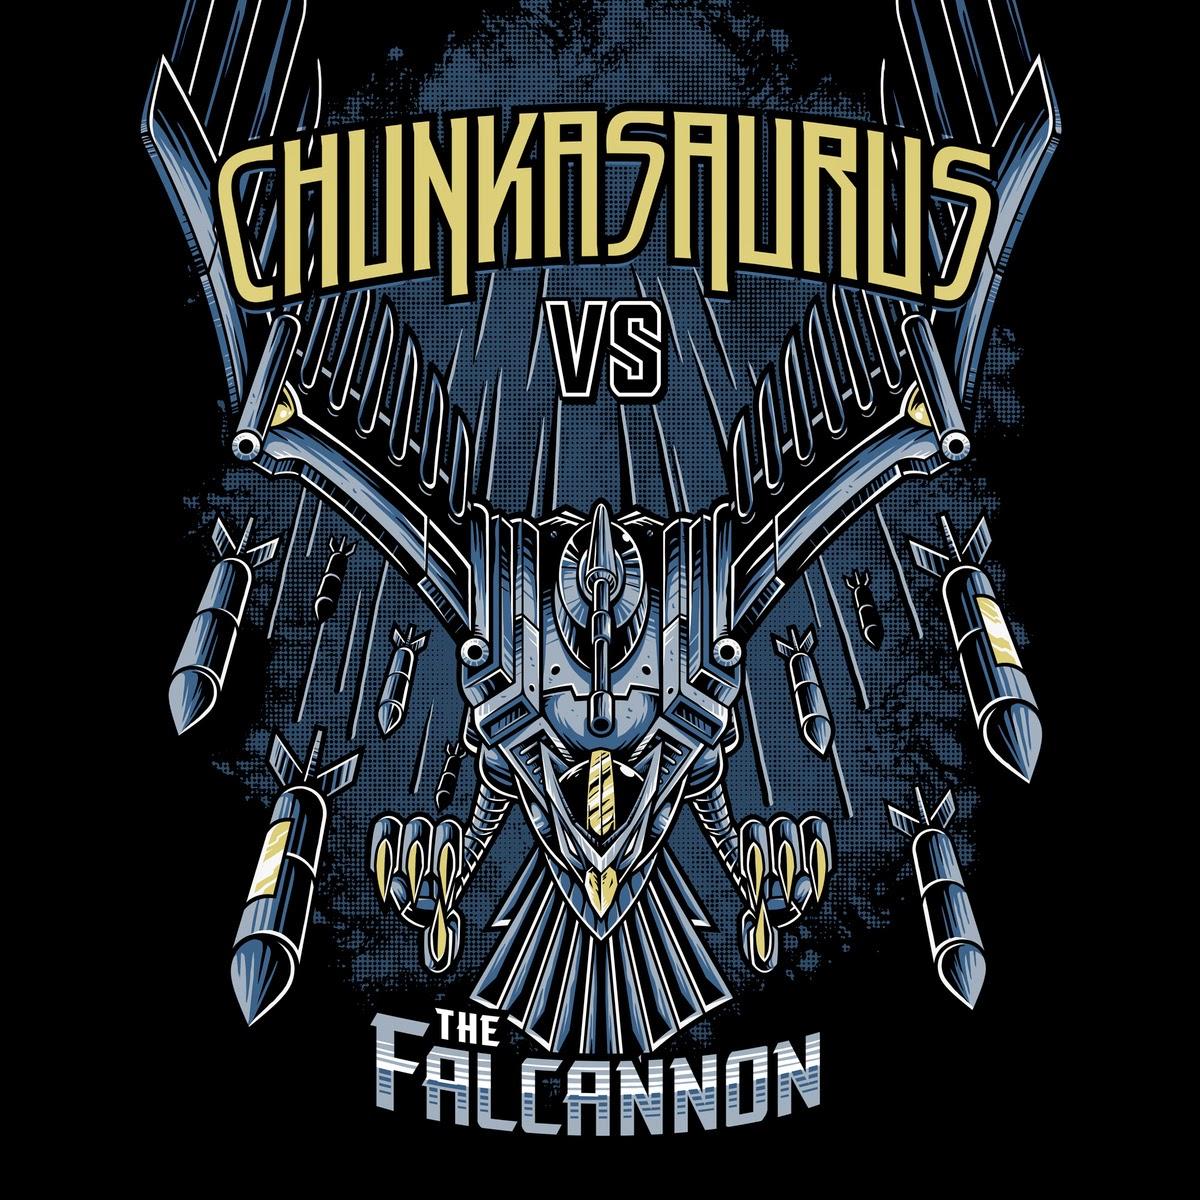 http://www.chunkasaurus.com/